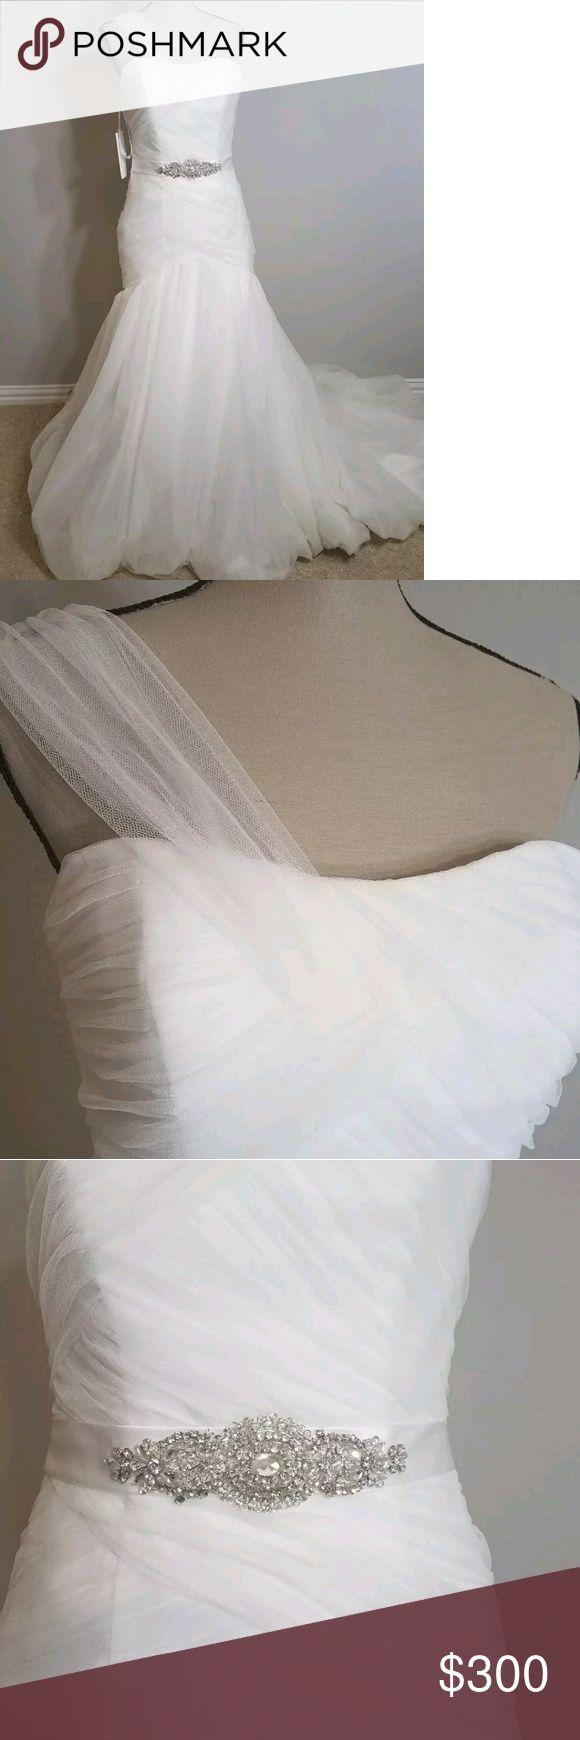 NWT Impression Bridal wedding gown by Zurc A line, one shoulder, dropped waist, floor length wedding gown with chapel length train. Embellished waist. Tags still attached. Impression Bridal Dresses Wedding